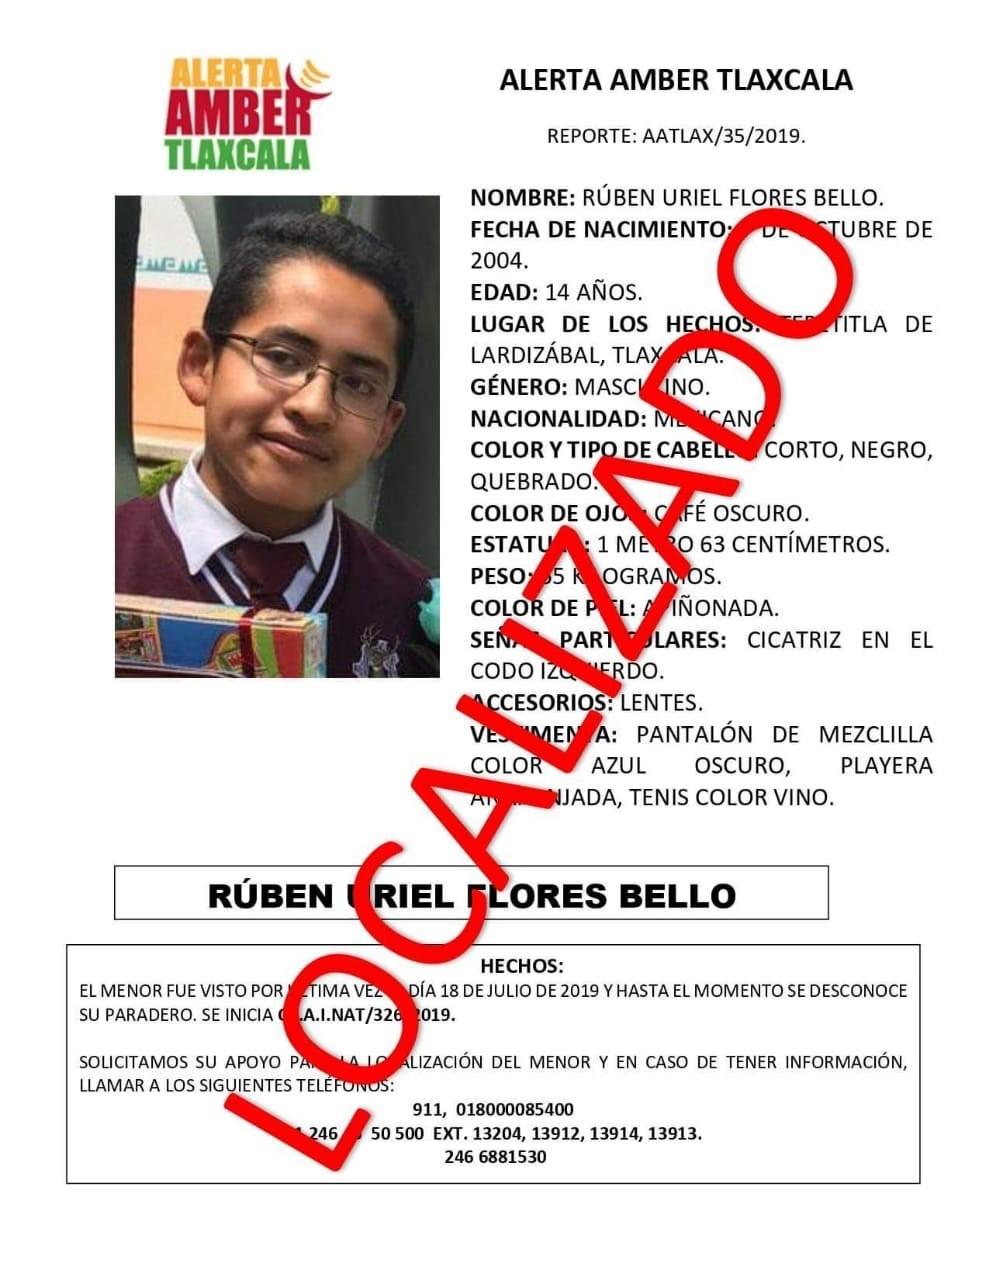 Ubican autoridades a menor reportado como desaparecido en Tepetitla de Lardizábal